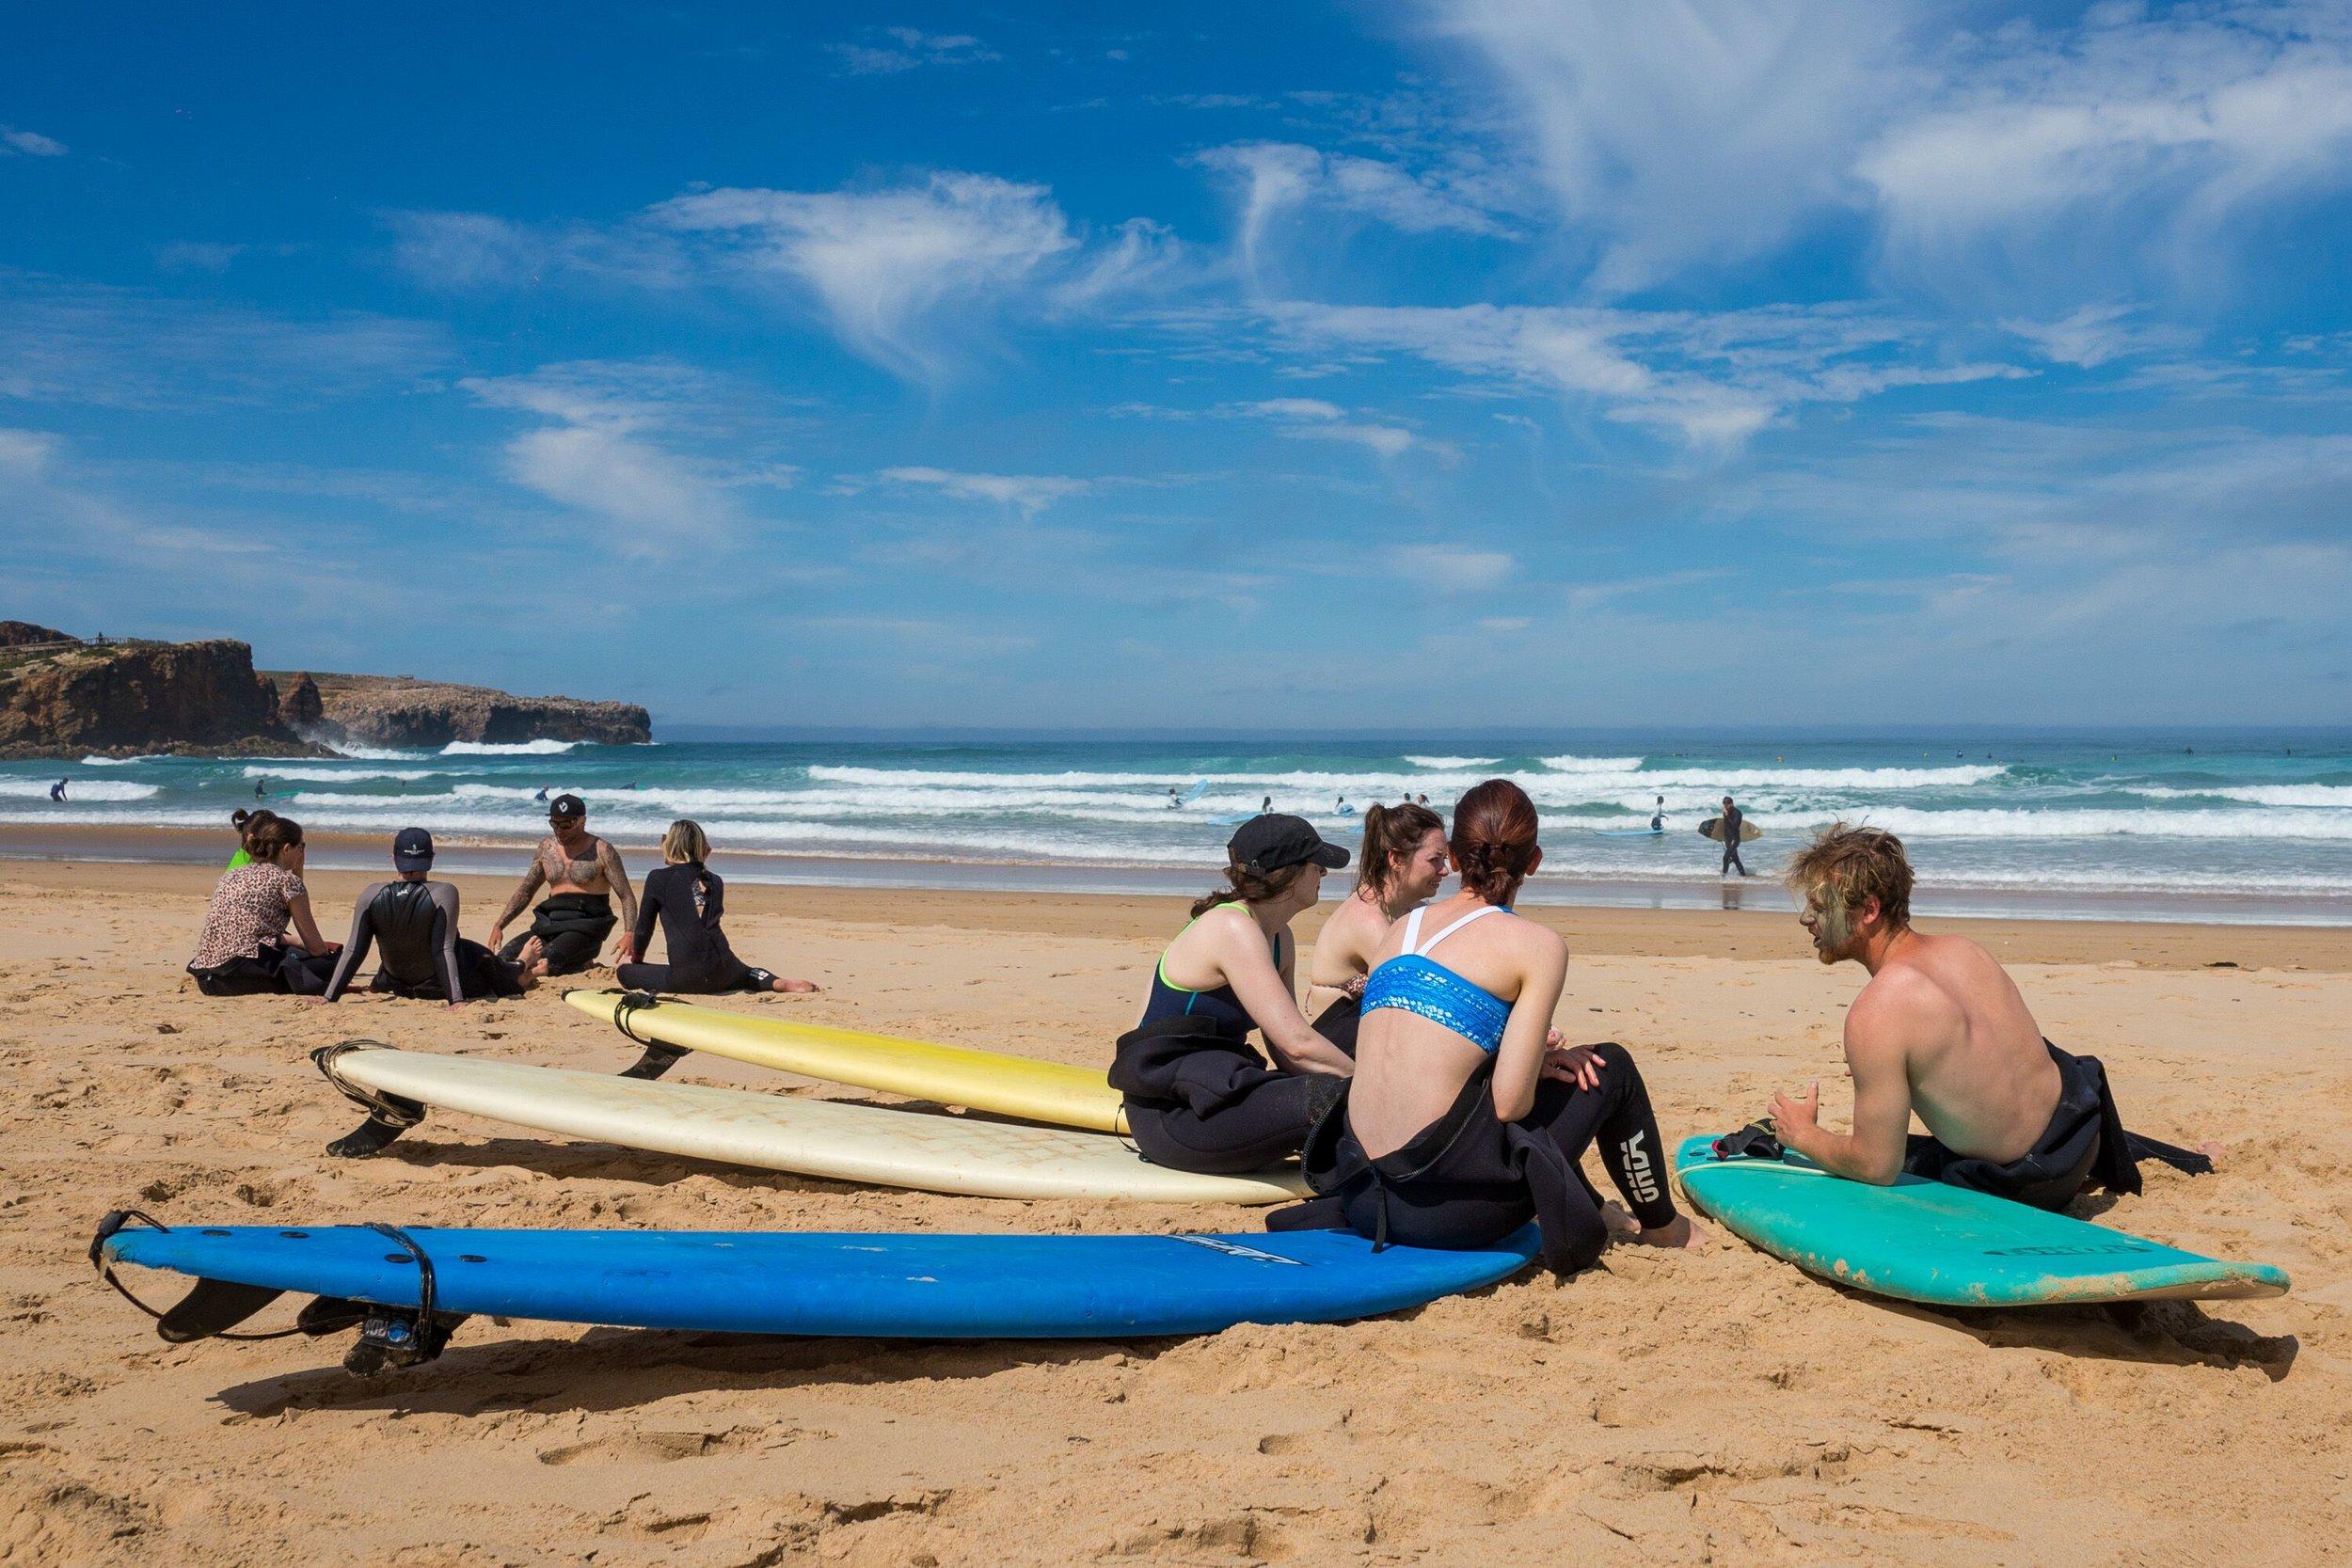 ride-on-retreats-surf-lesson.jpg